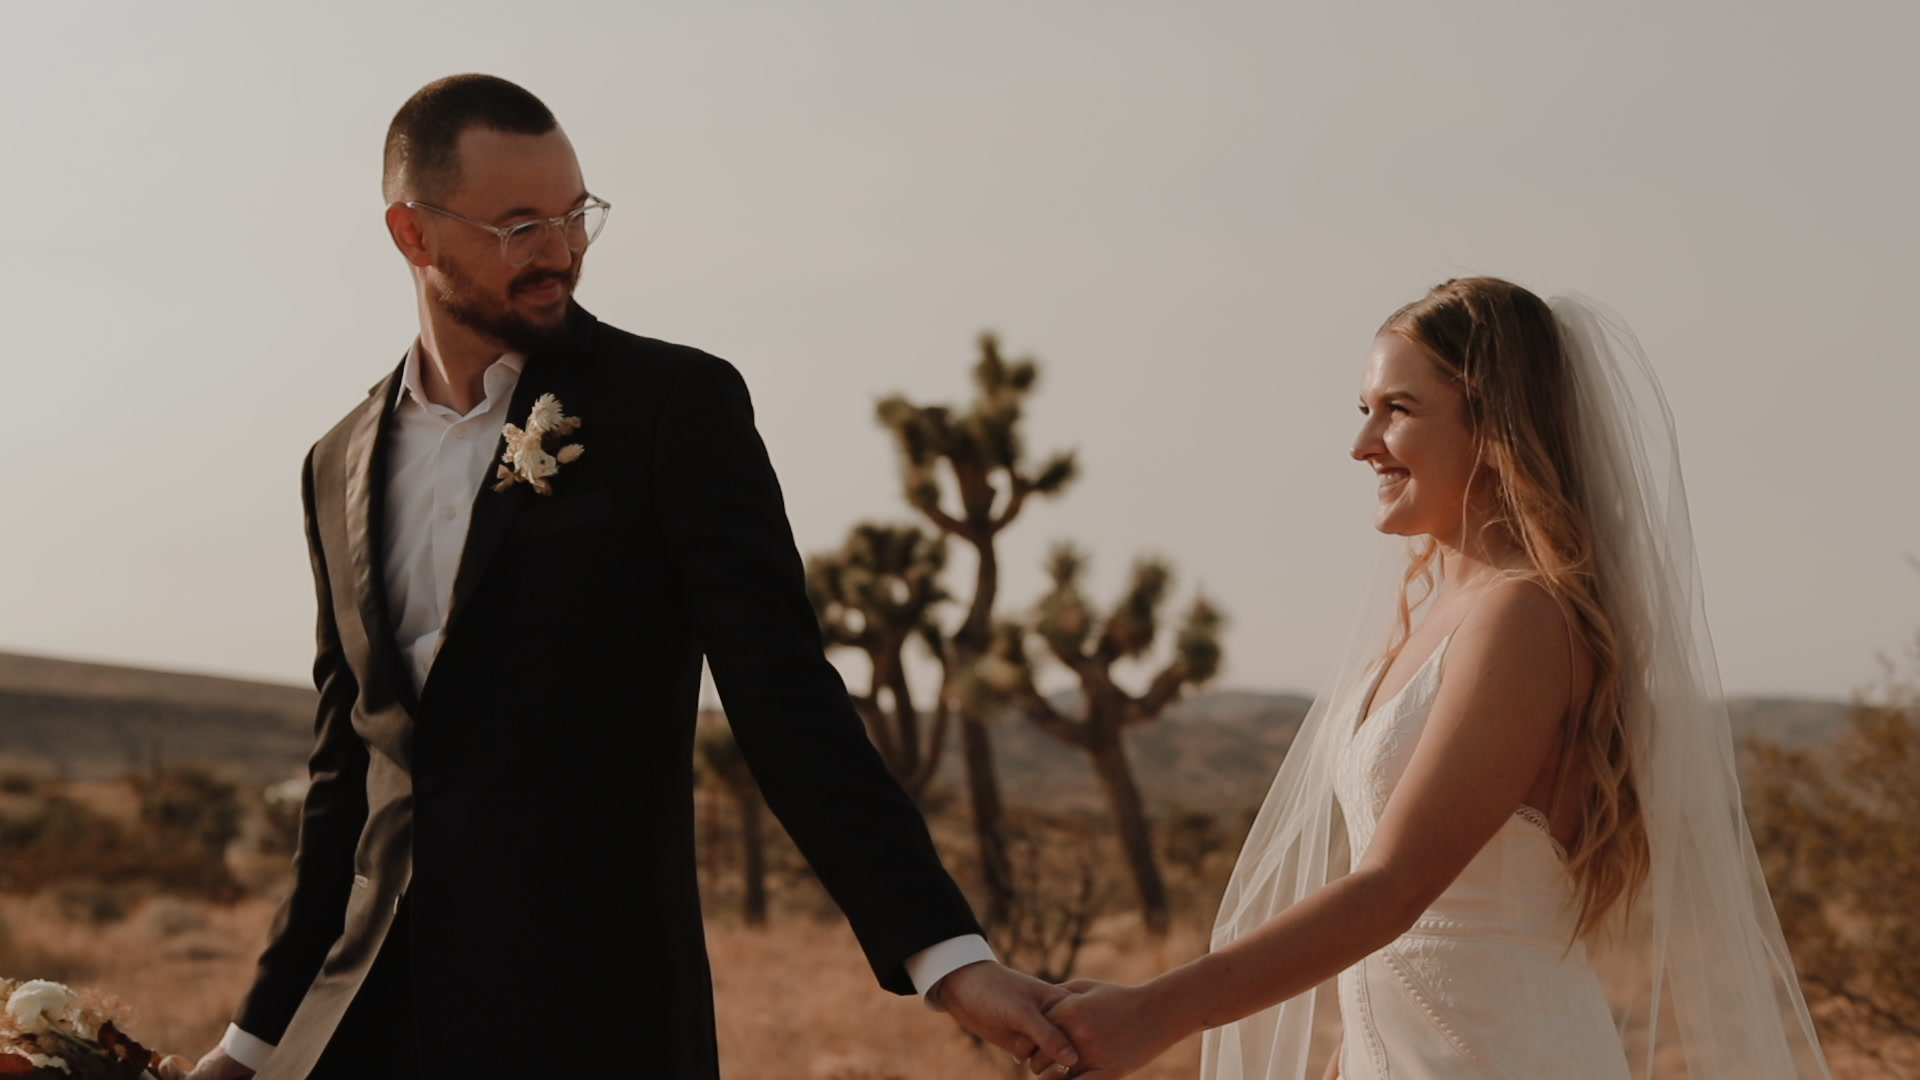 Angela + Josh | Joshua Tree, California | Desert Sage House